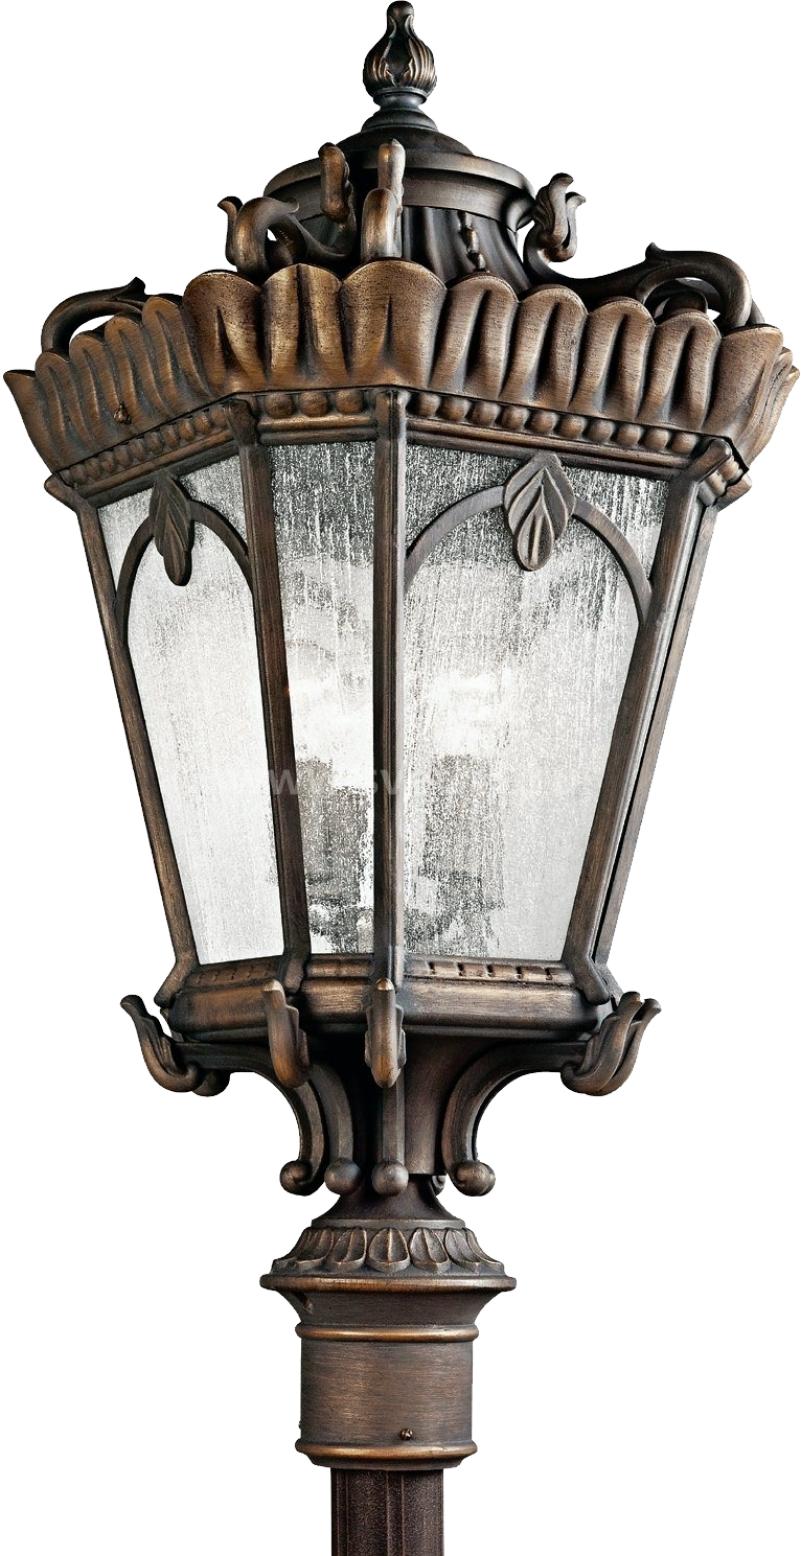 Street Light PNG Image